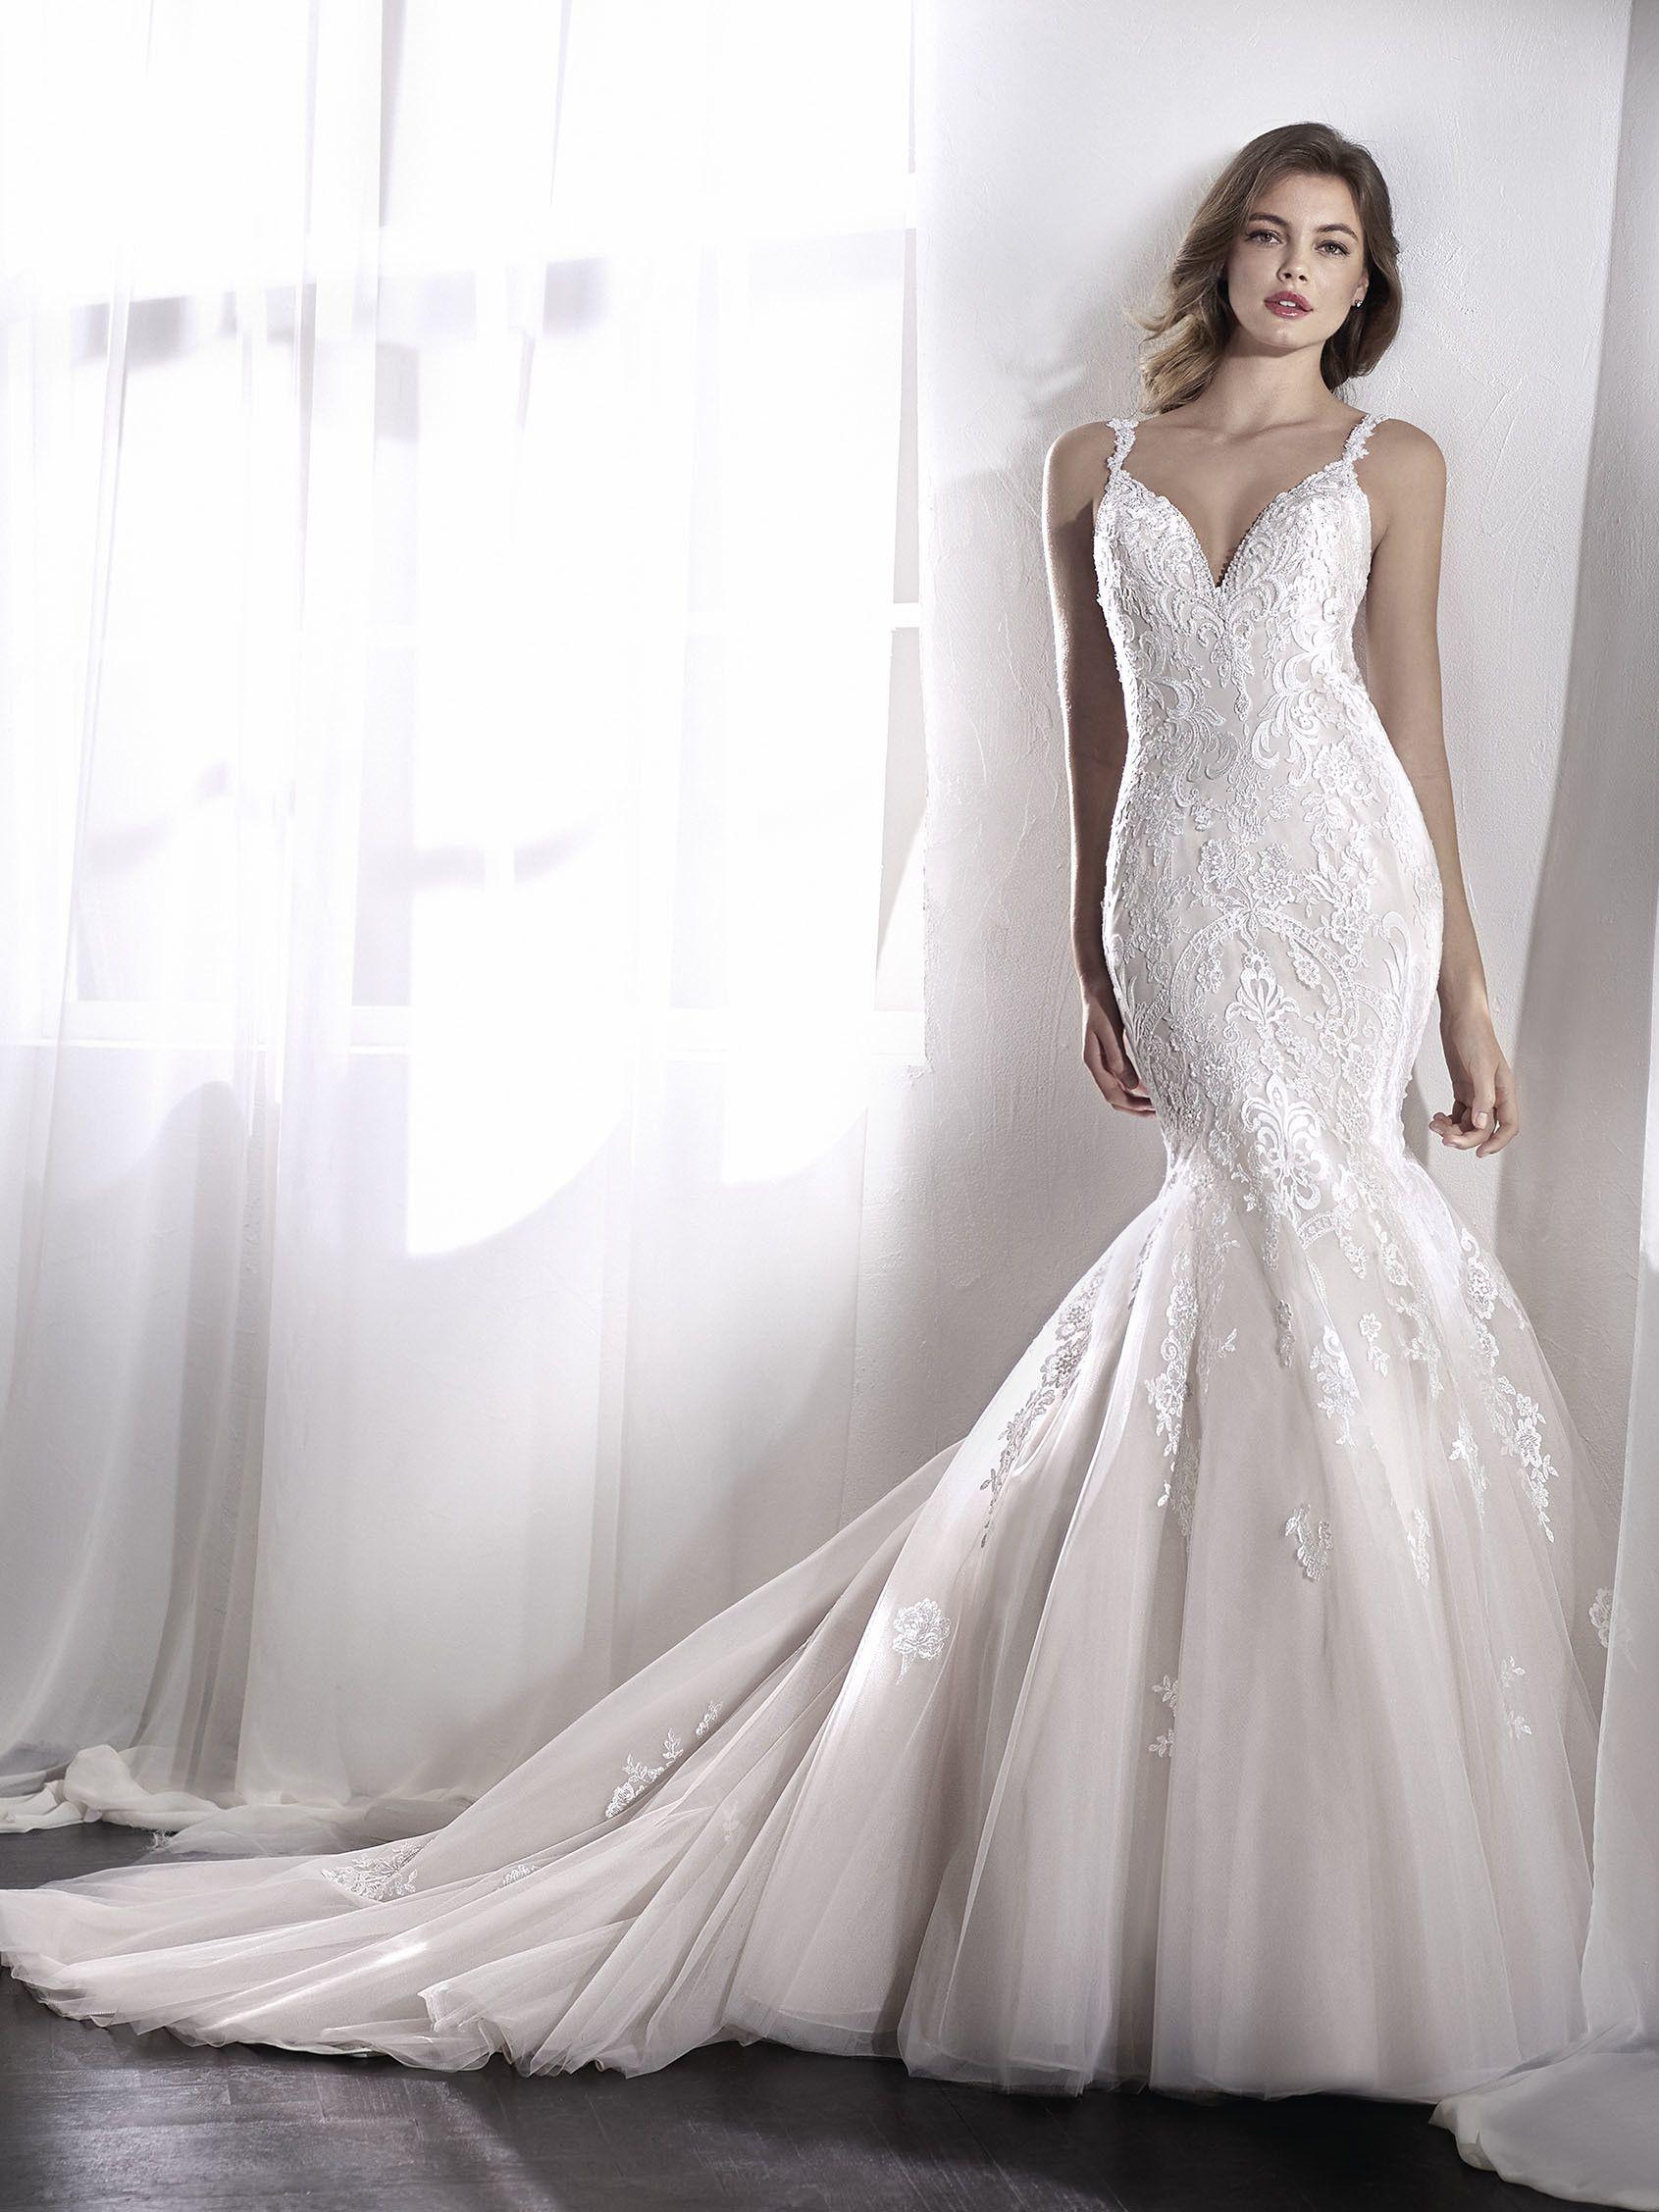 2e80fc01c LEVIRAS vestido de novia corte sirena Catalogo De Vestidos